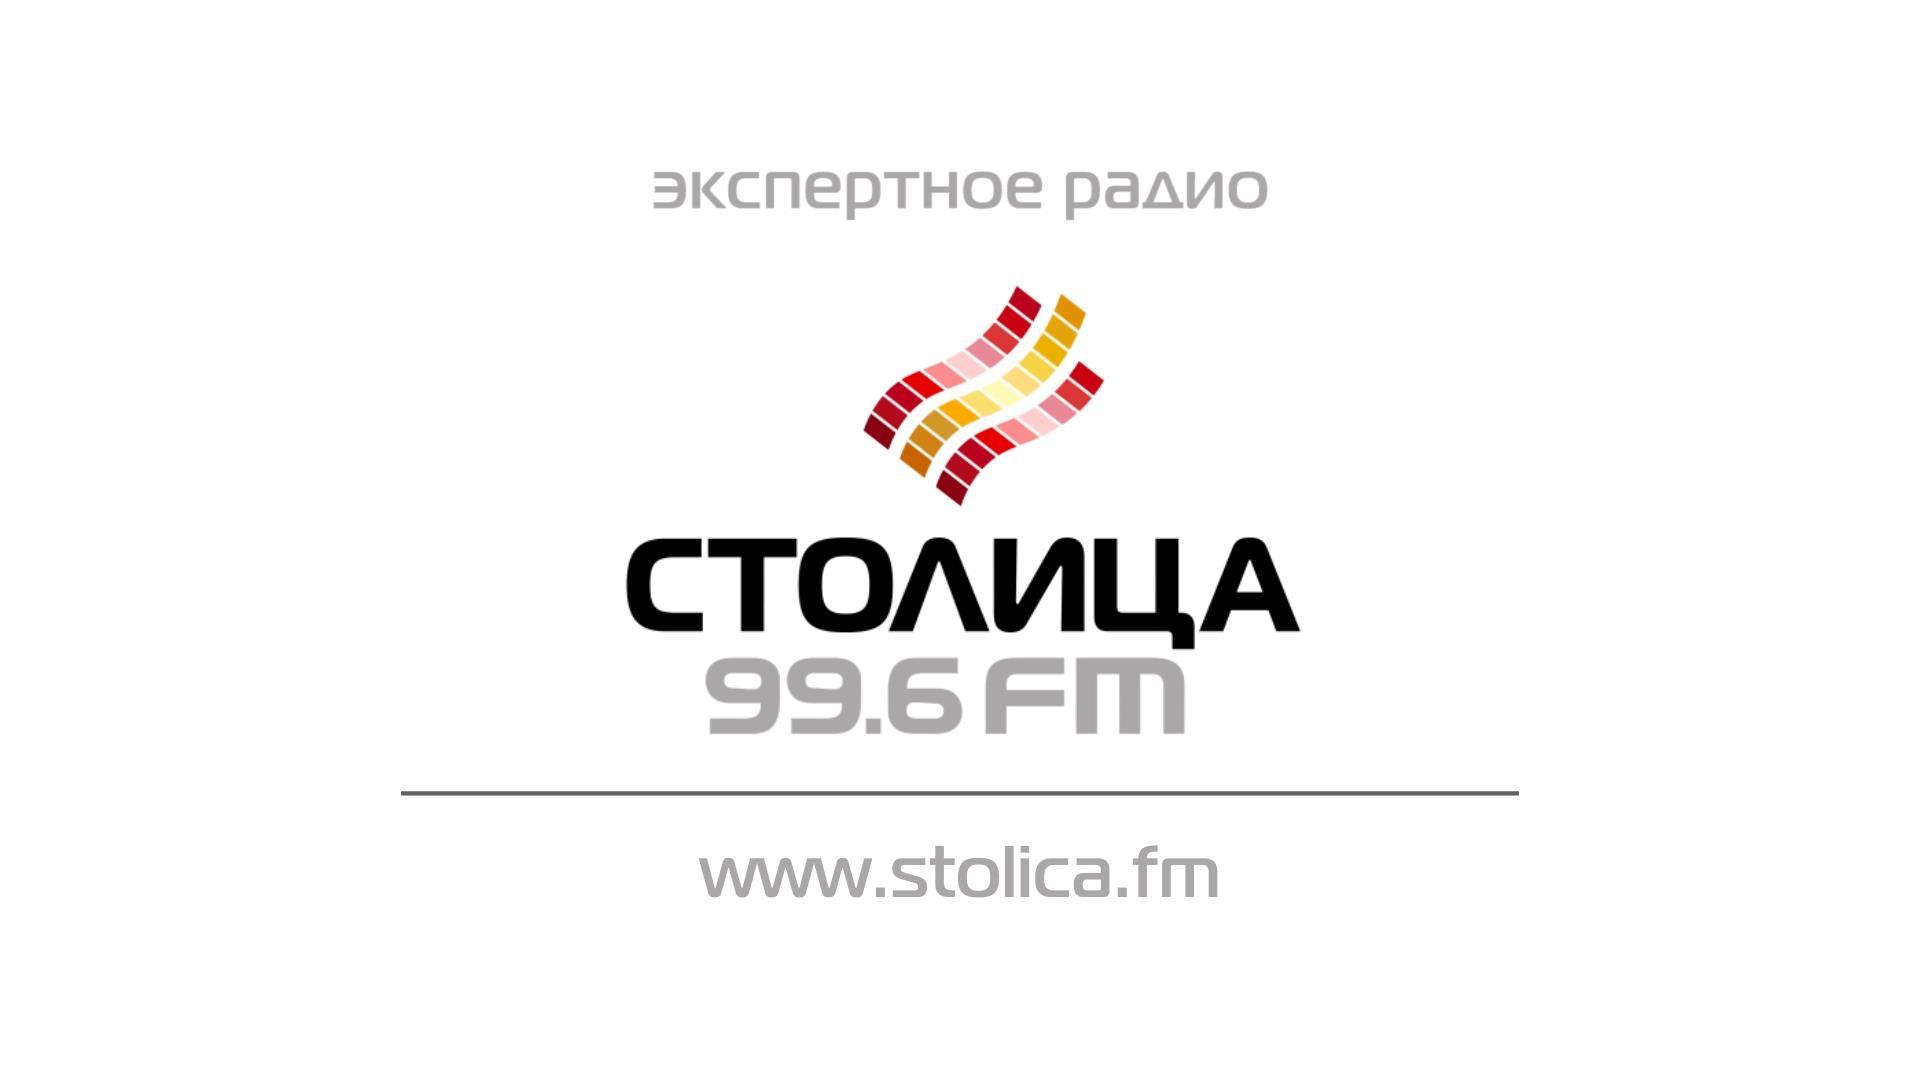 Радио Столица 99.6 FM. Видеореклама, заставка, анимация логотипа.